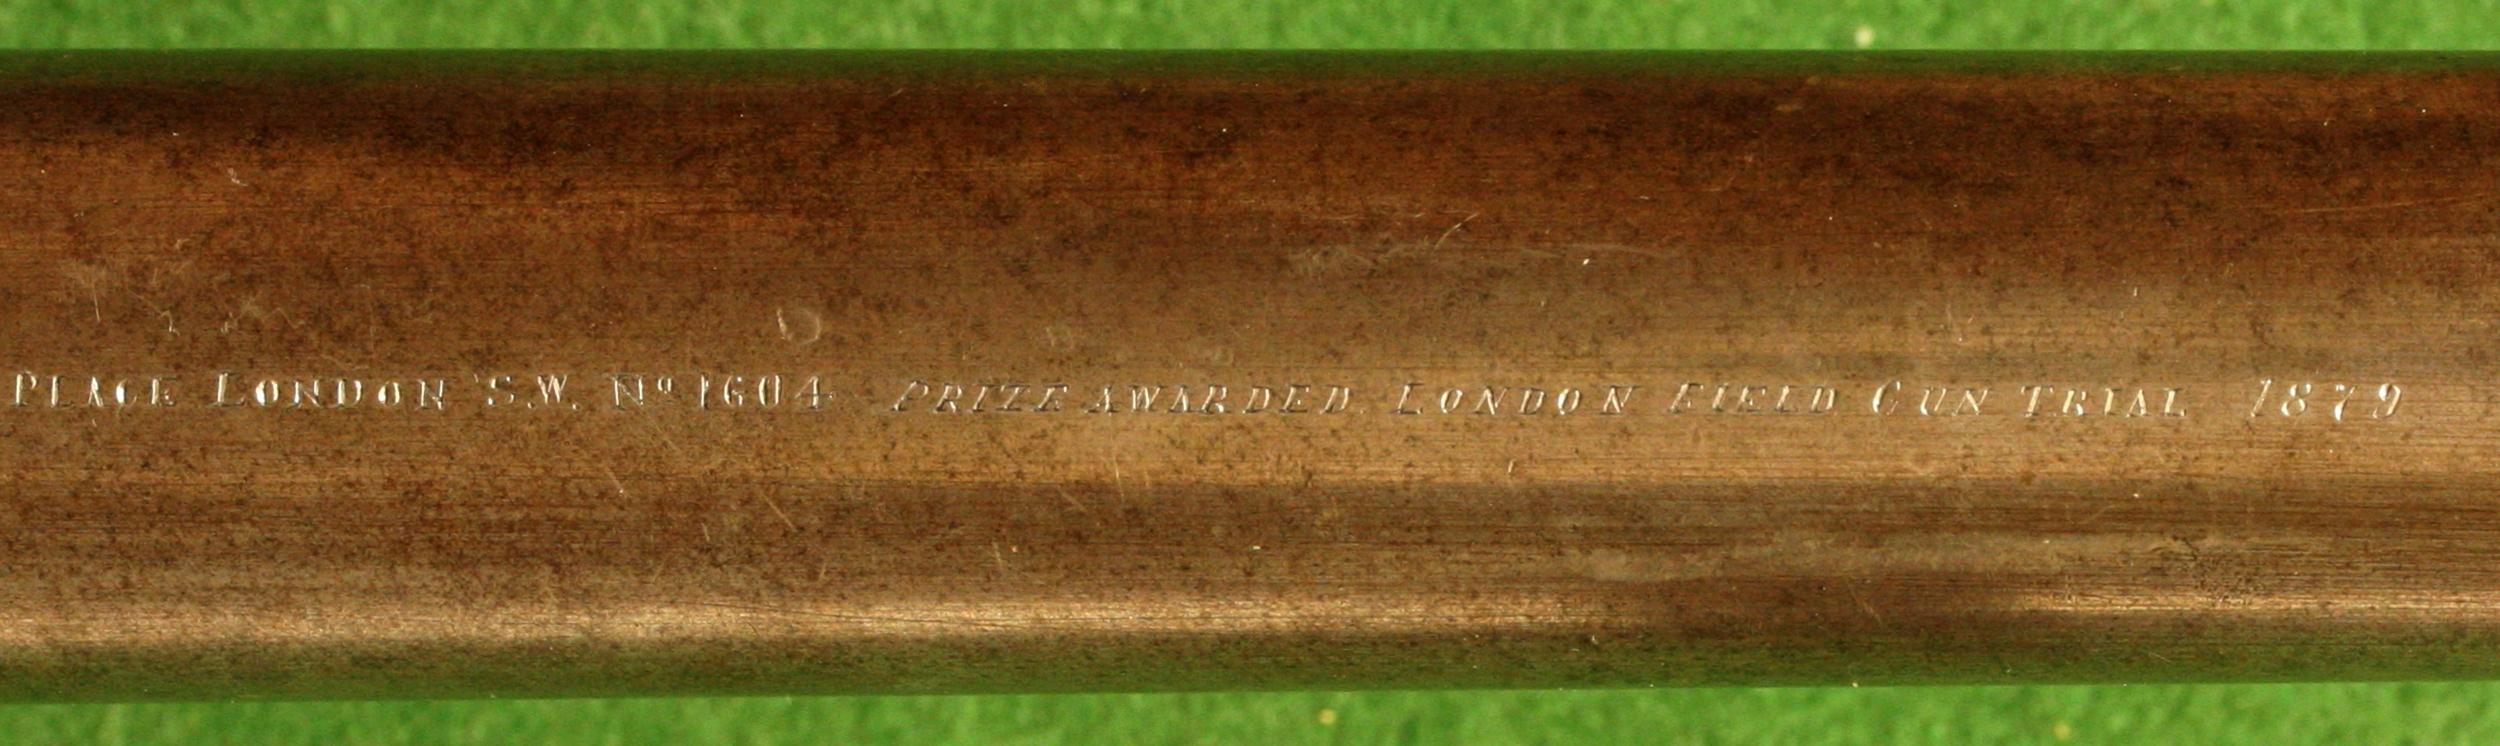 maleham-barrel-done-2